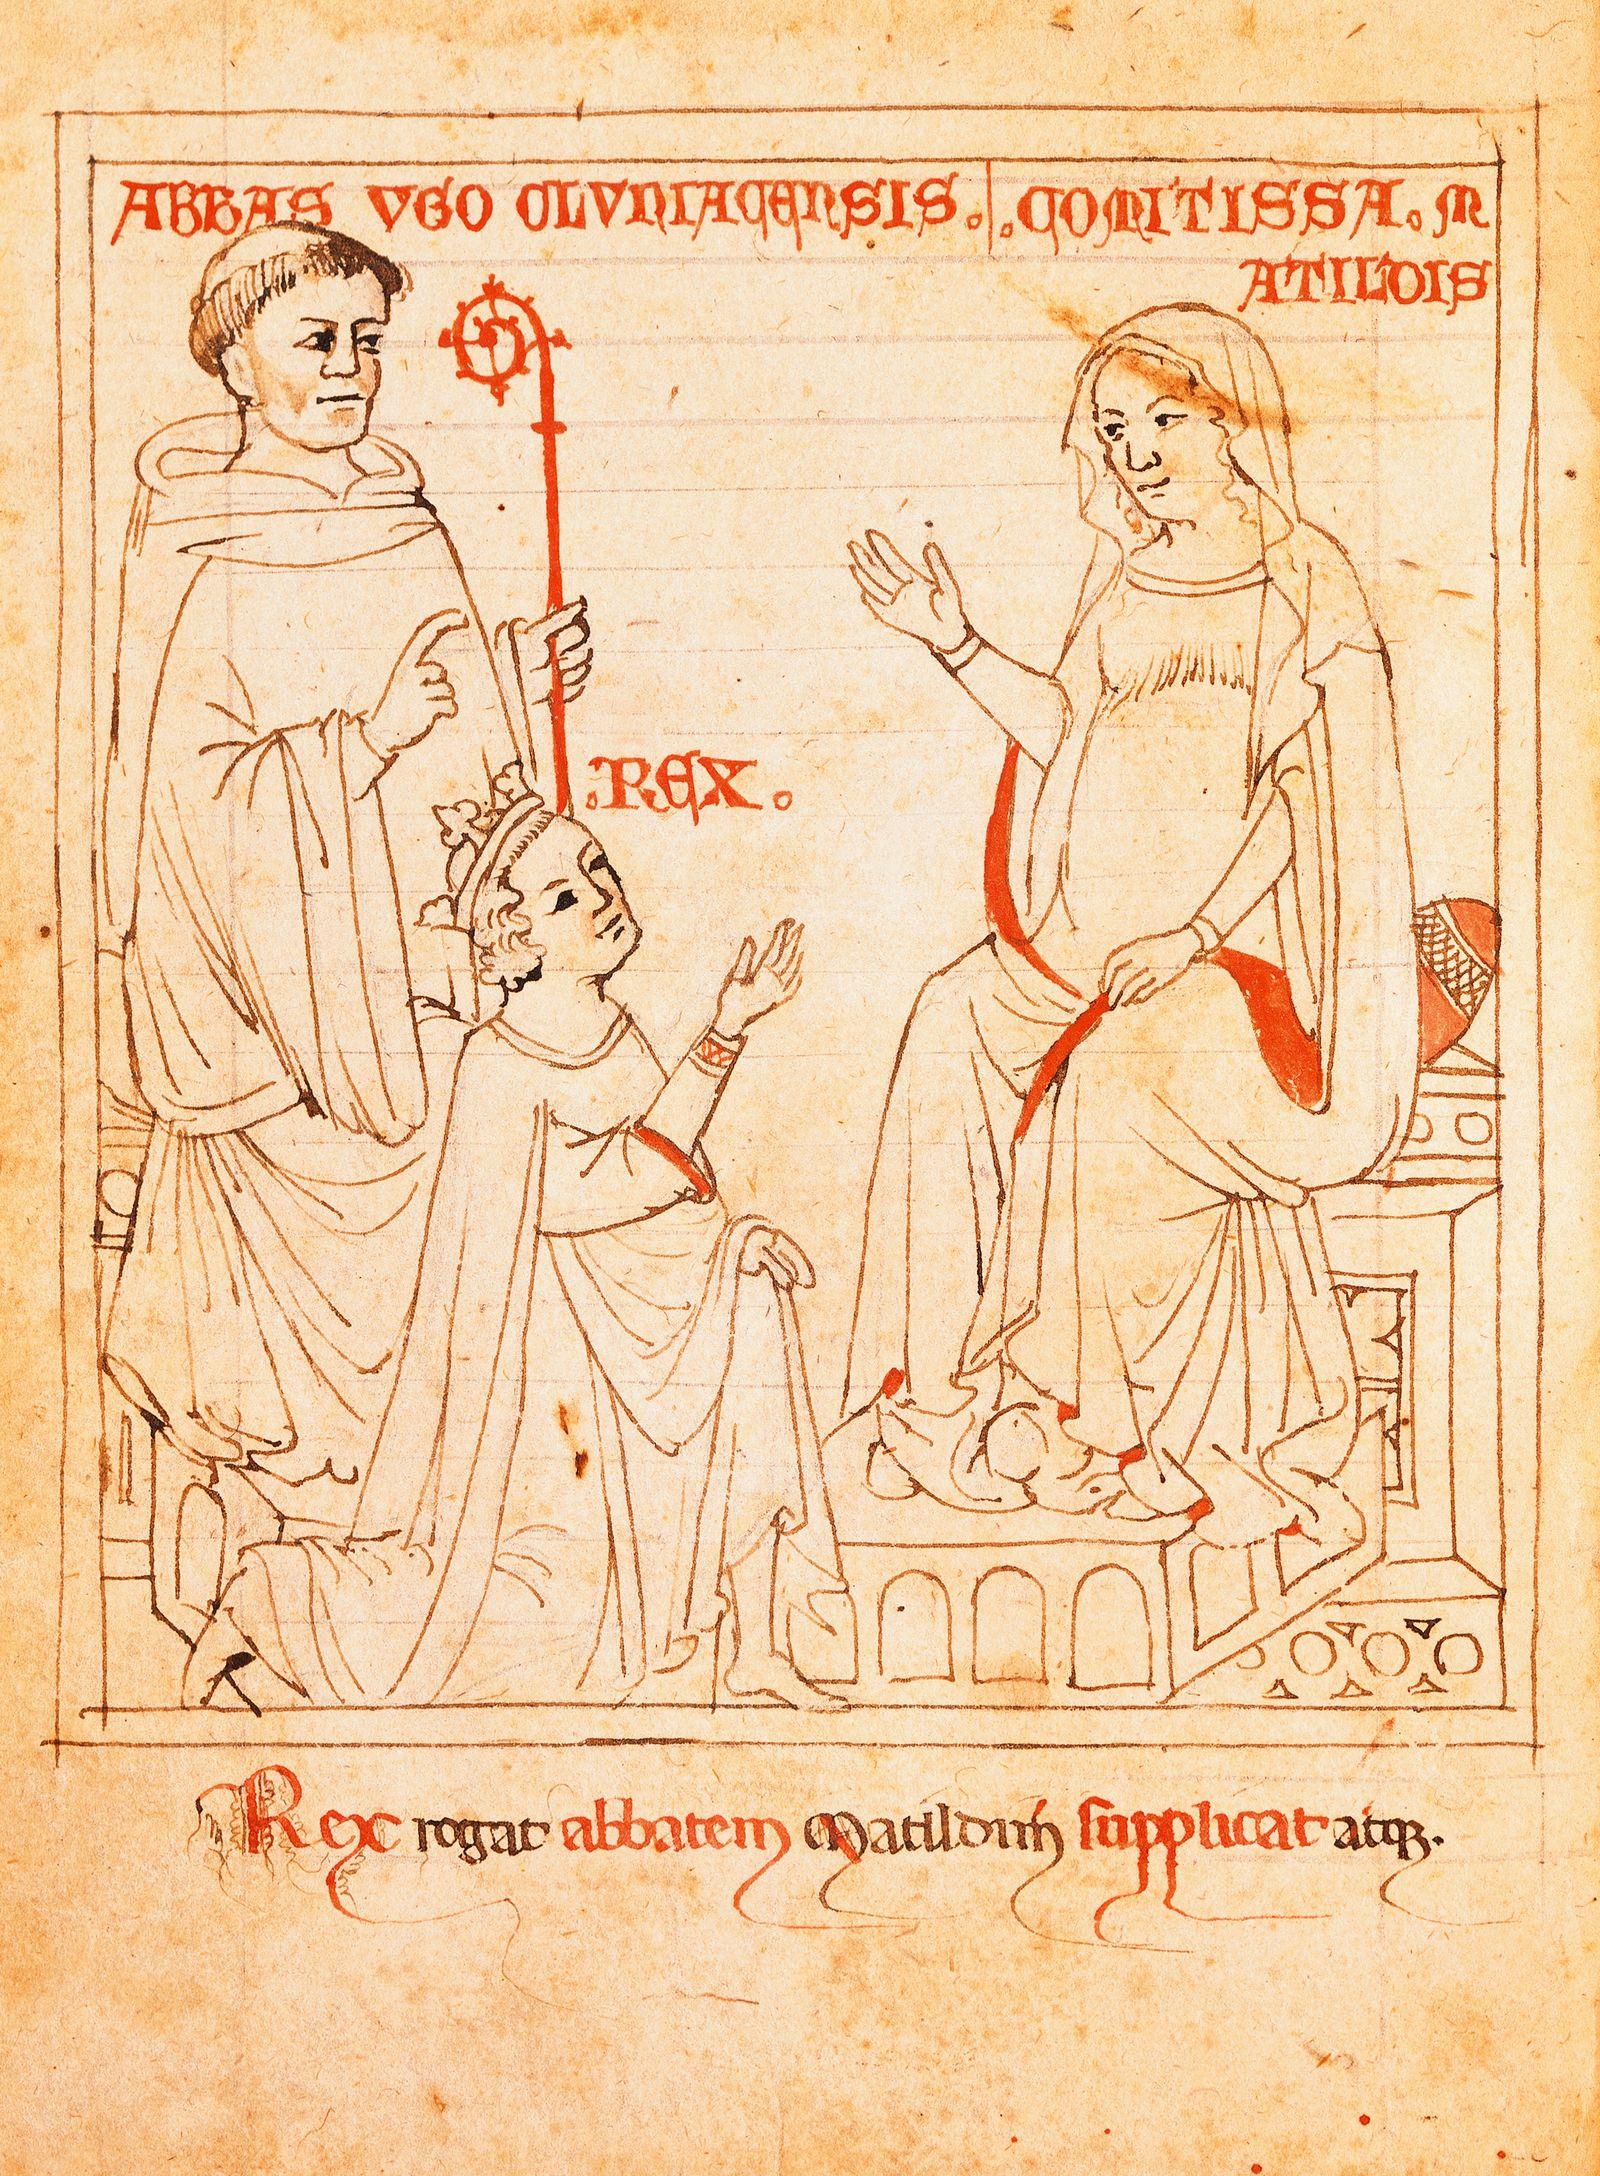 Abbot Ugo Oluntagensis, Countess Matilda of Tuscany and the king, miniature from Vita Mathildis, manuscript, 11th-12th Century.